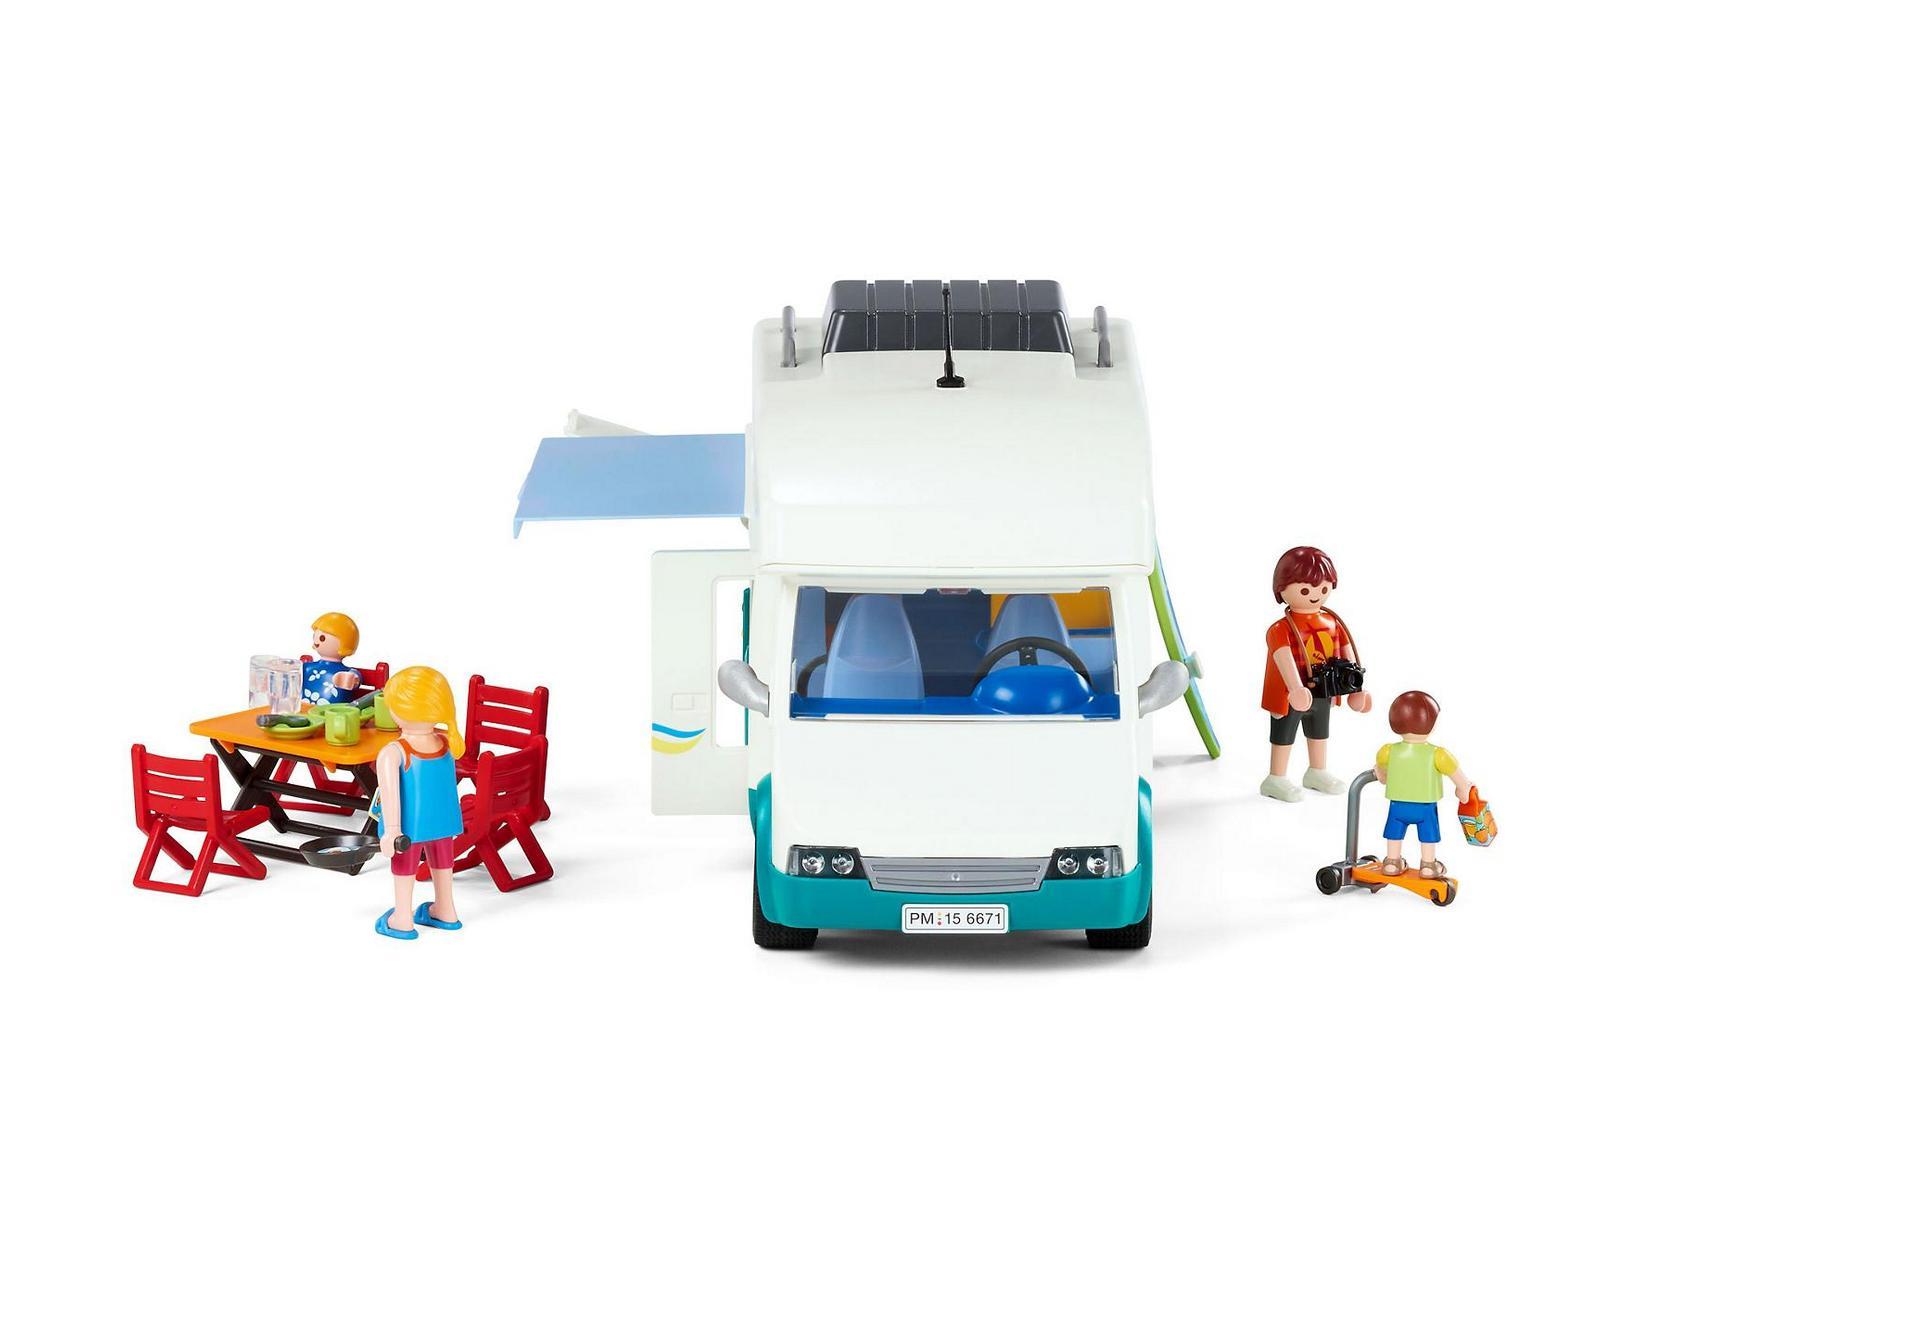 Ausmalbilder Playmobil Familien : Familien Wohnmobil 6671 Playmobil Schweiz